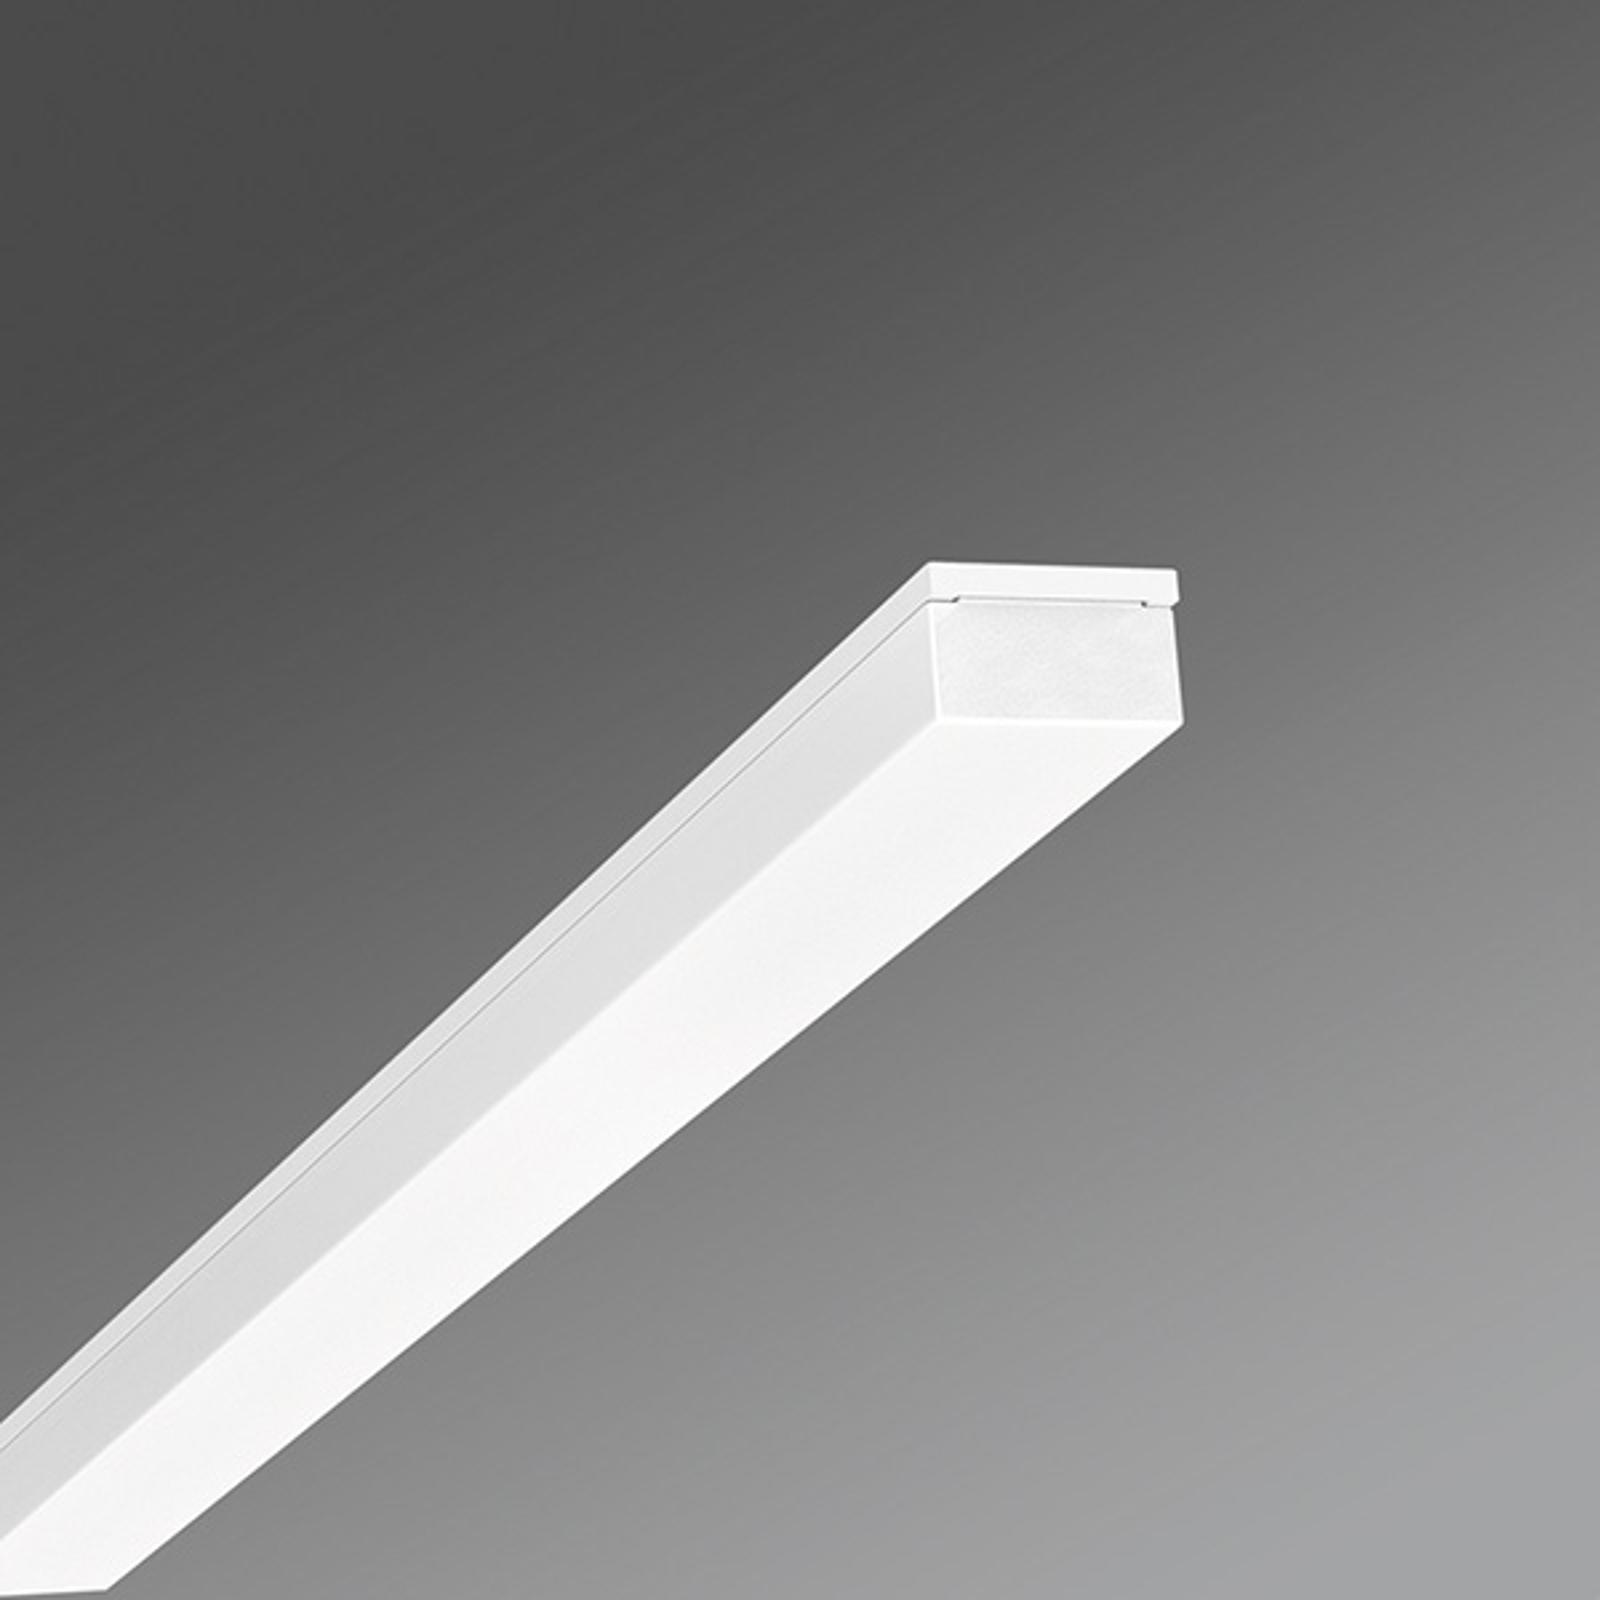 Diffusor opaal - LED plafondlamp Wotek-WKO/1200 ww